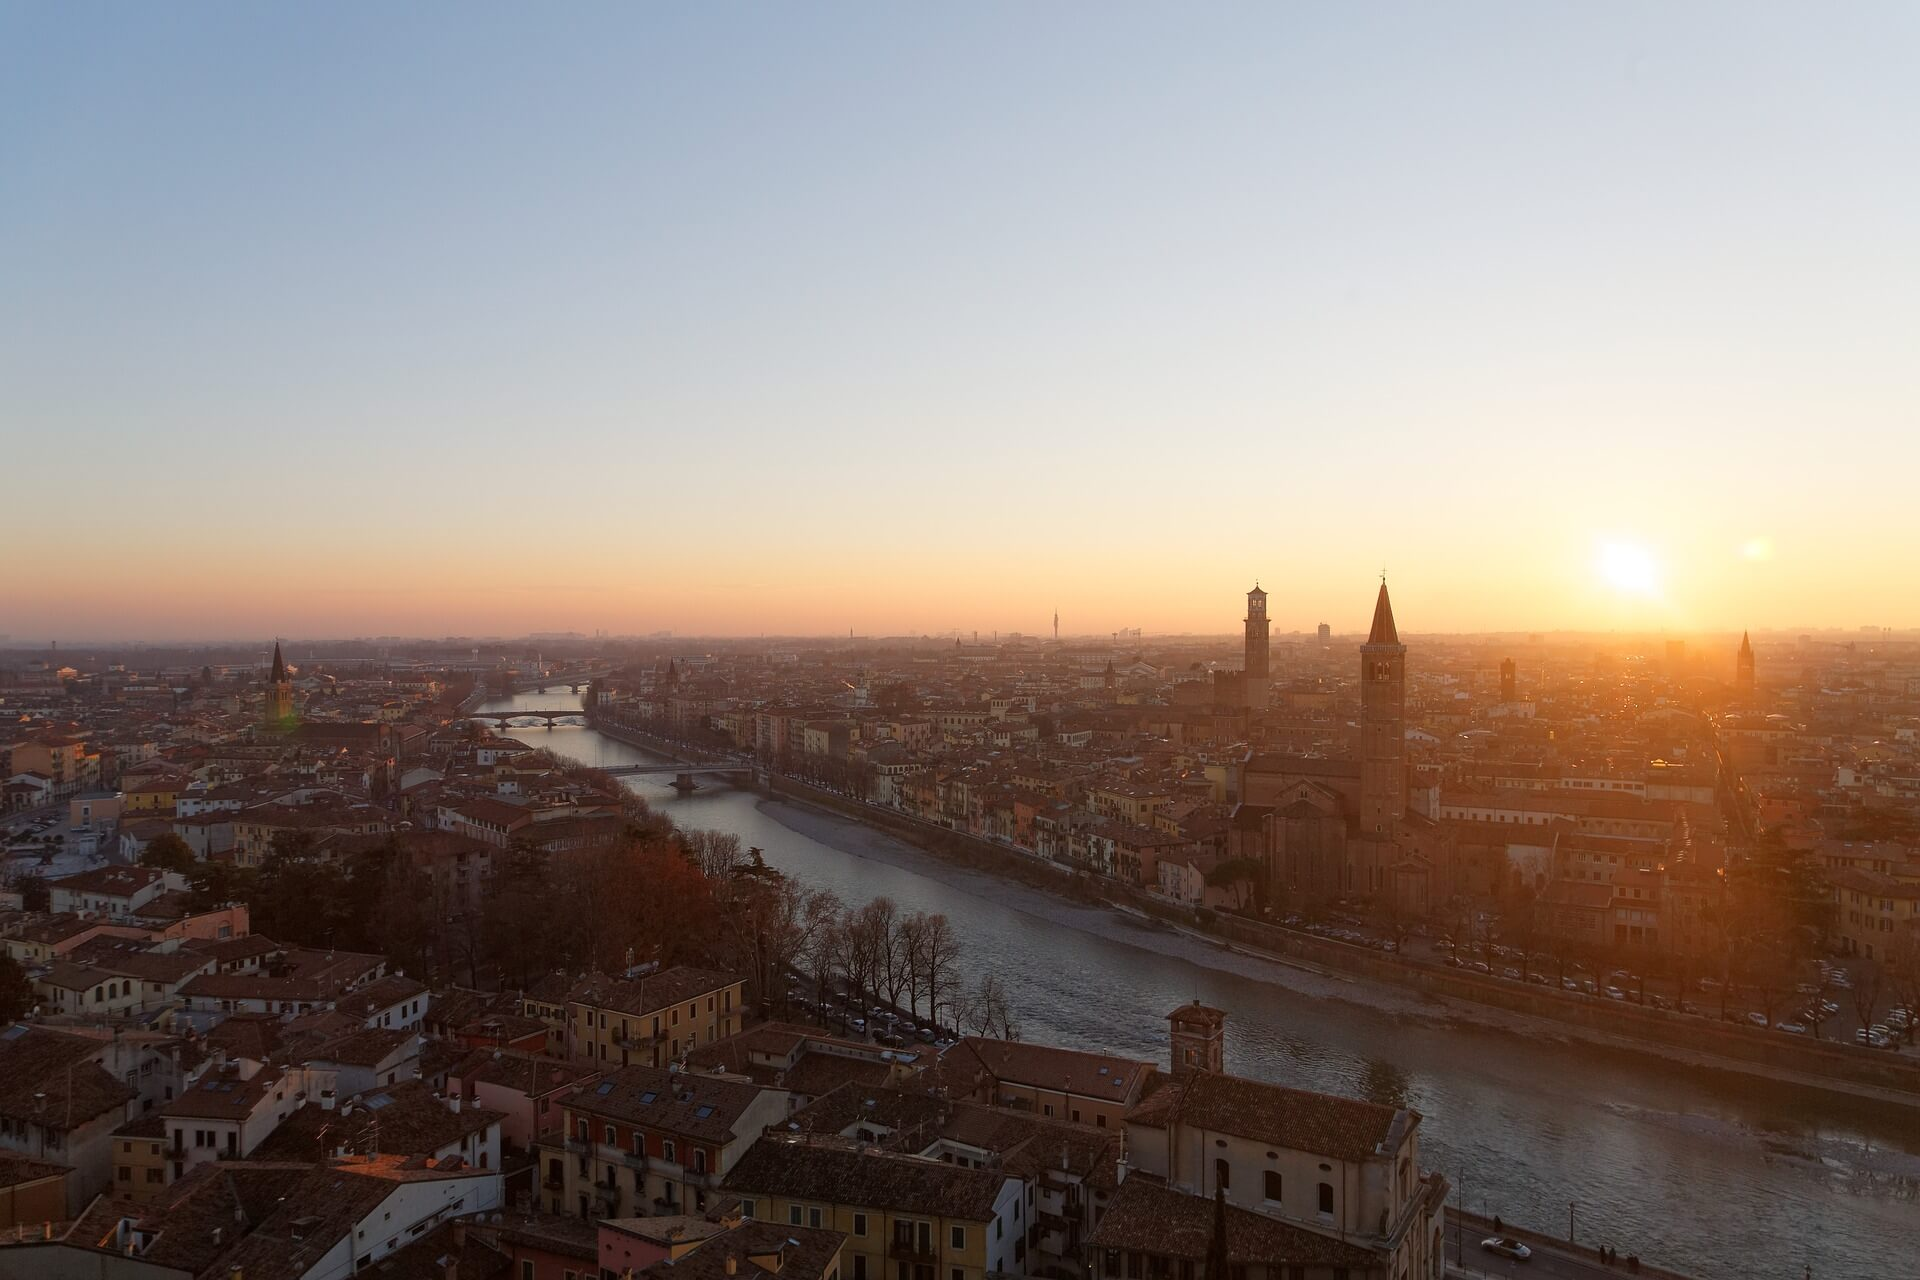 Direktflüge ab Köln/Bonn nach Verona